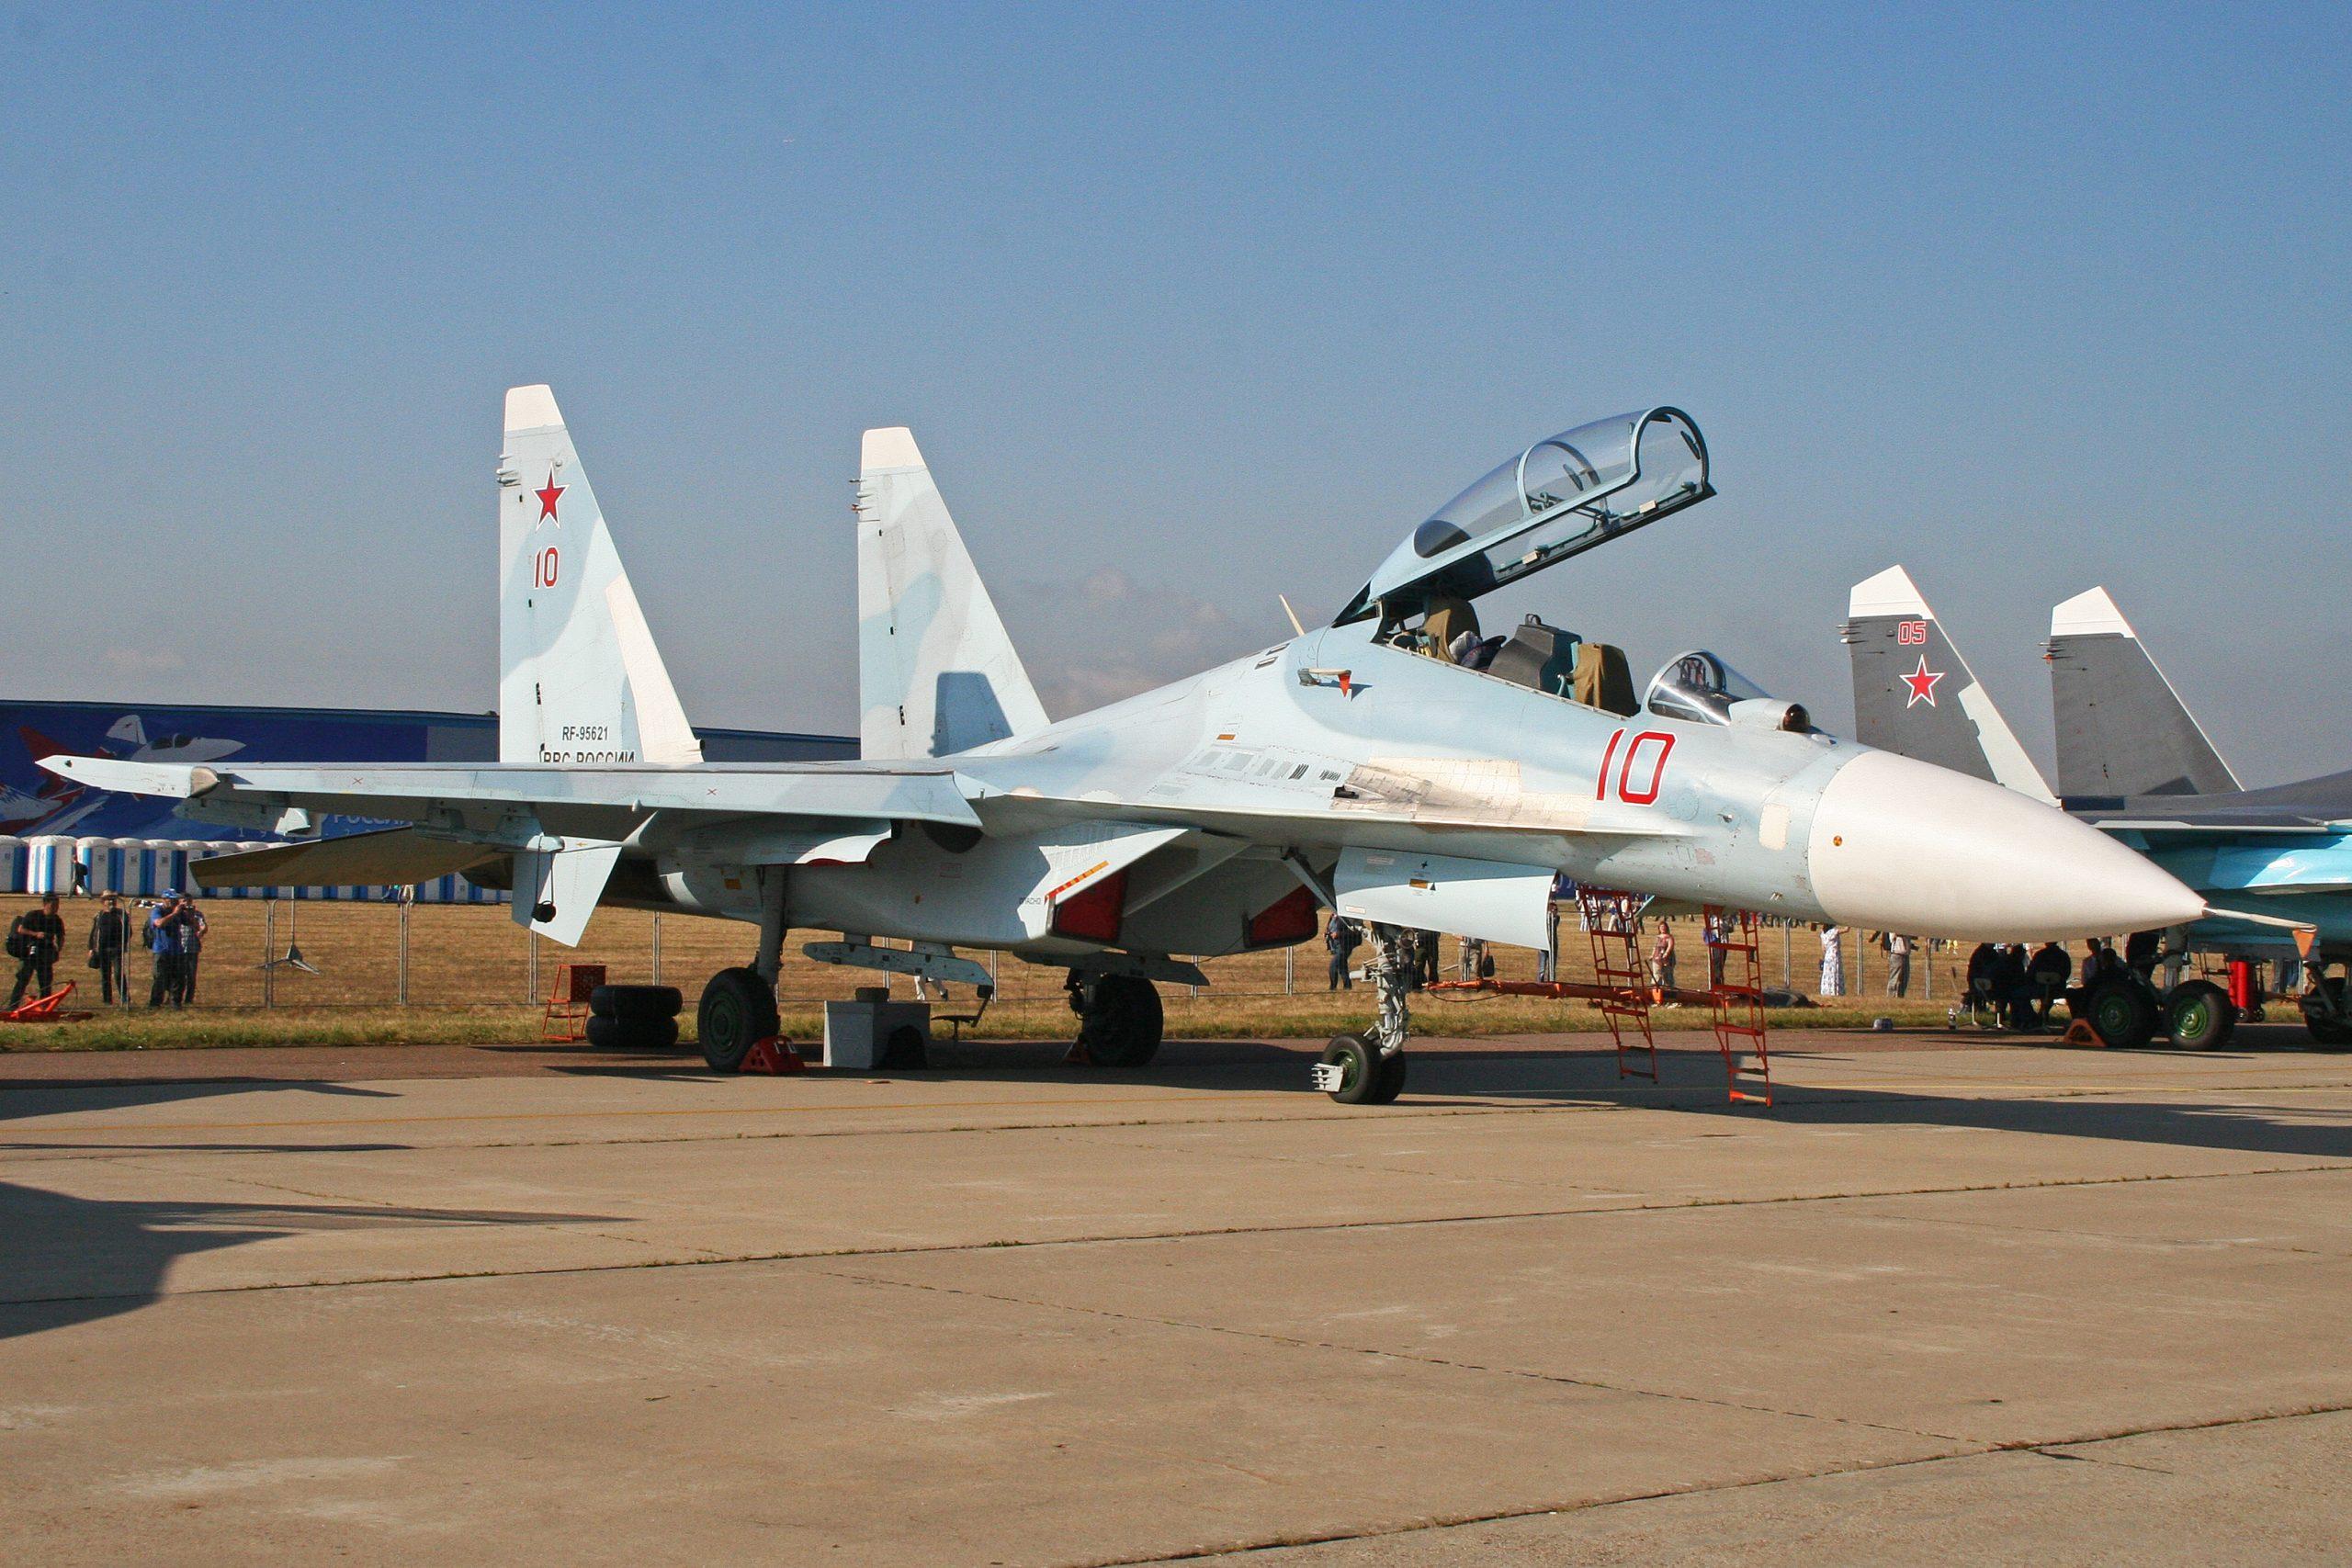 Russian Su-30M. Photo credit: Alan Wilson